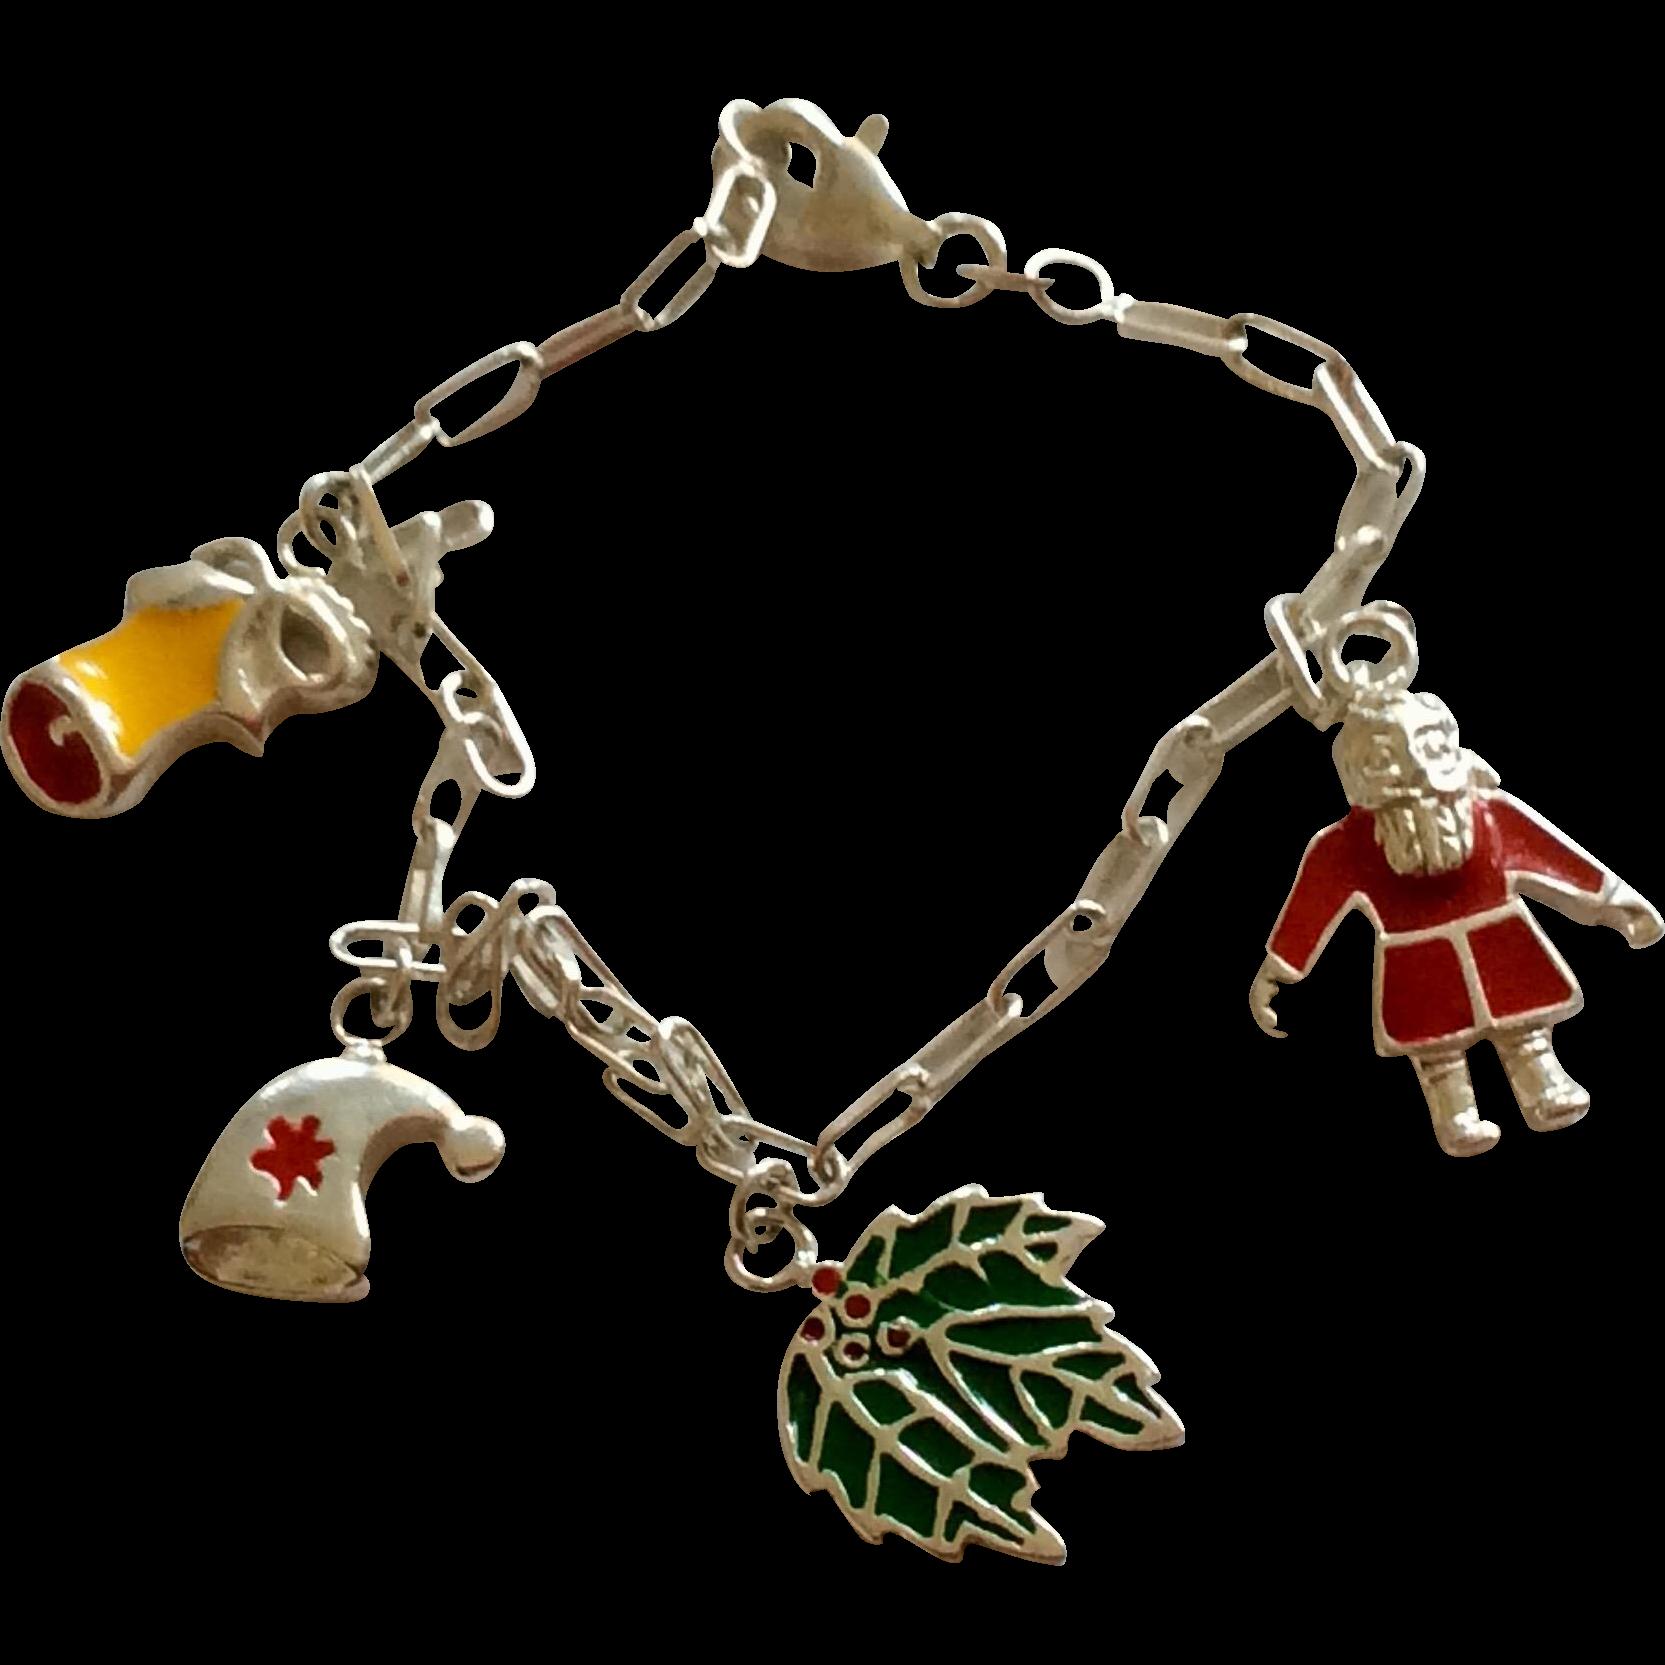 Best Charm Bracelet: Vintage Sterling Silver Enamel Christmas Charm Bracelet